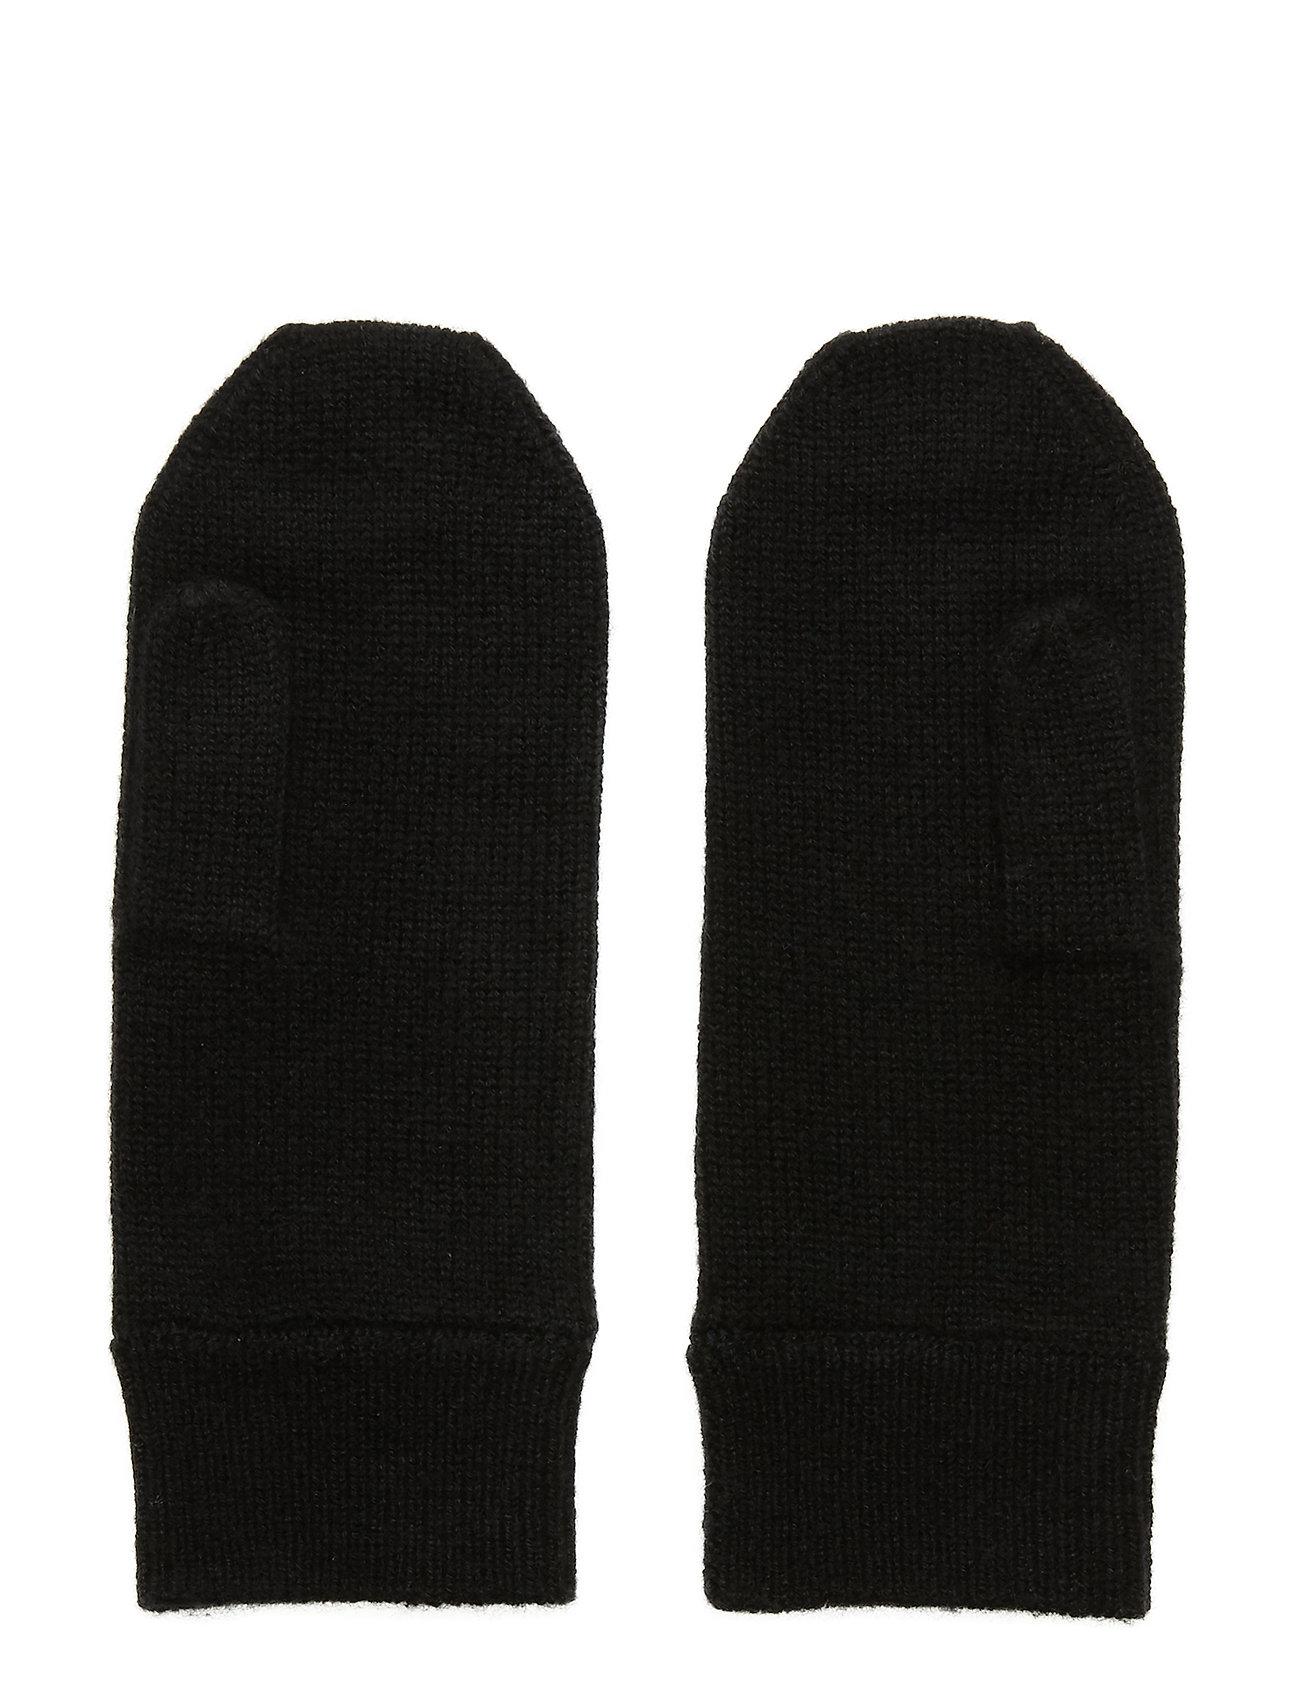 Davida Cashmere - Mittens - accessories - black - 1